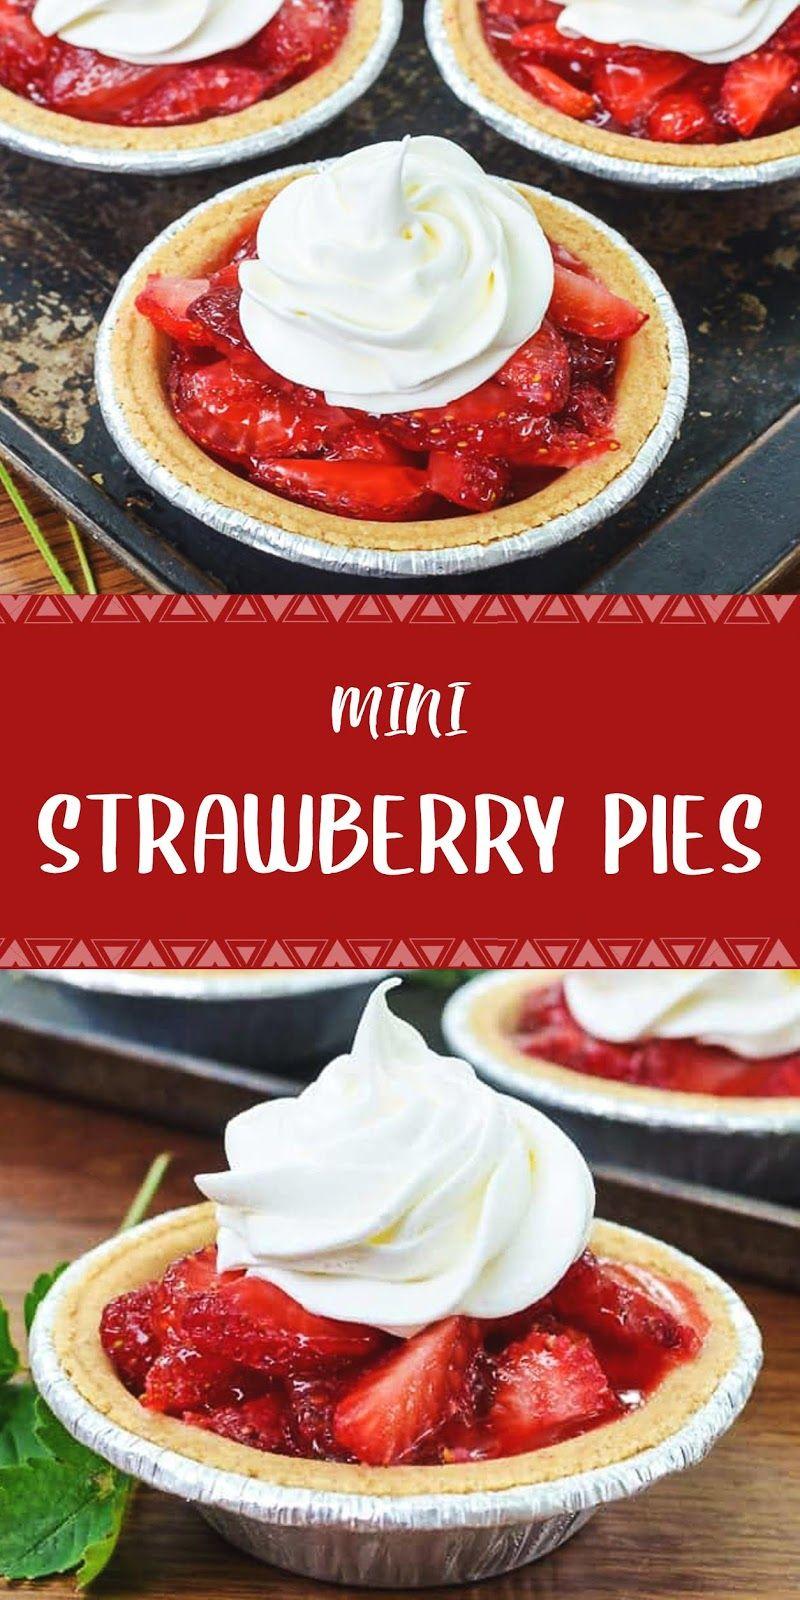 Mini Strawberry Pies Healthy Recipes Resep Makanan Penutup Hidangan Penutup Memanggang Kue